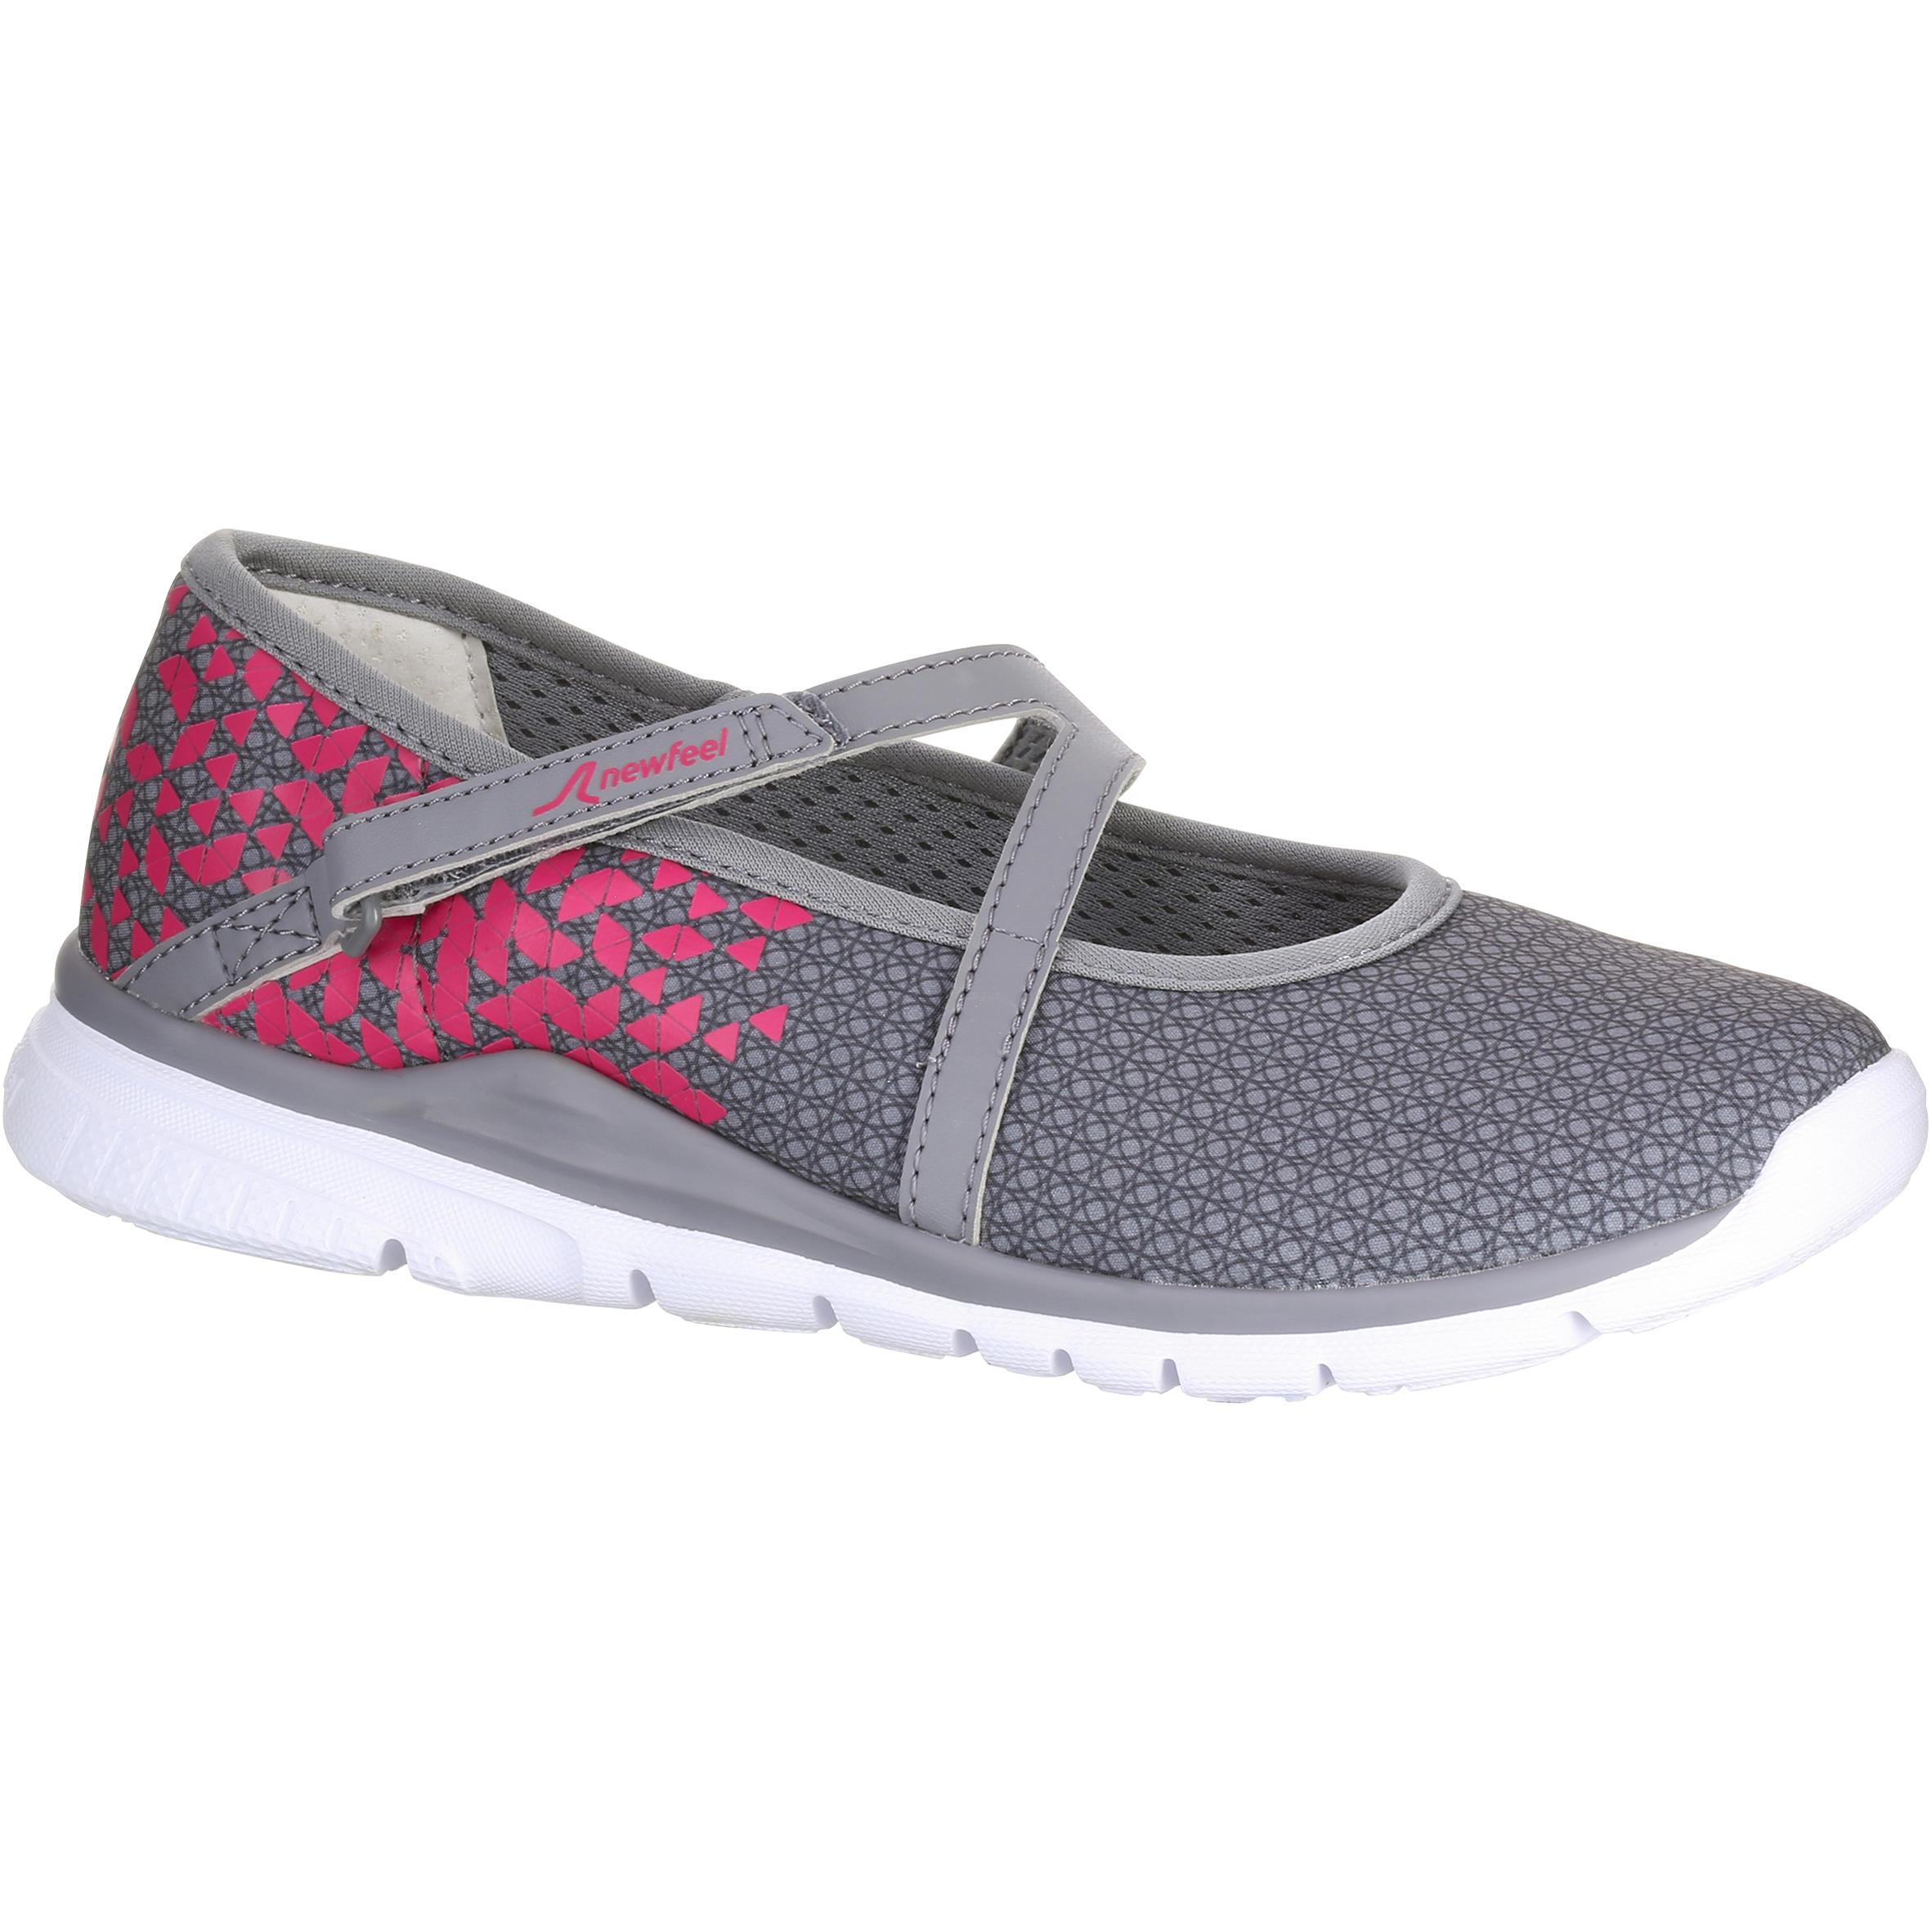 newfeel chaussures marche sportive enfant ballerine marine decathlon. Black Bedroom Furniture Sets. Home Design Ideas